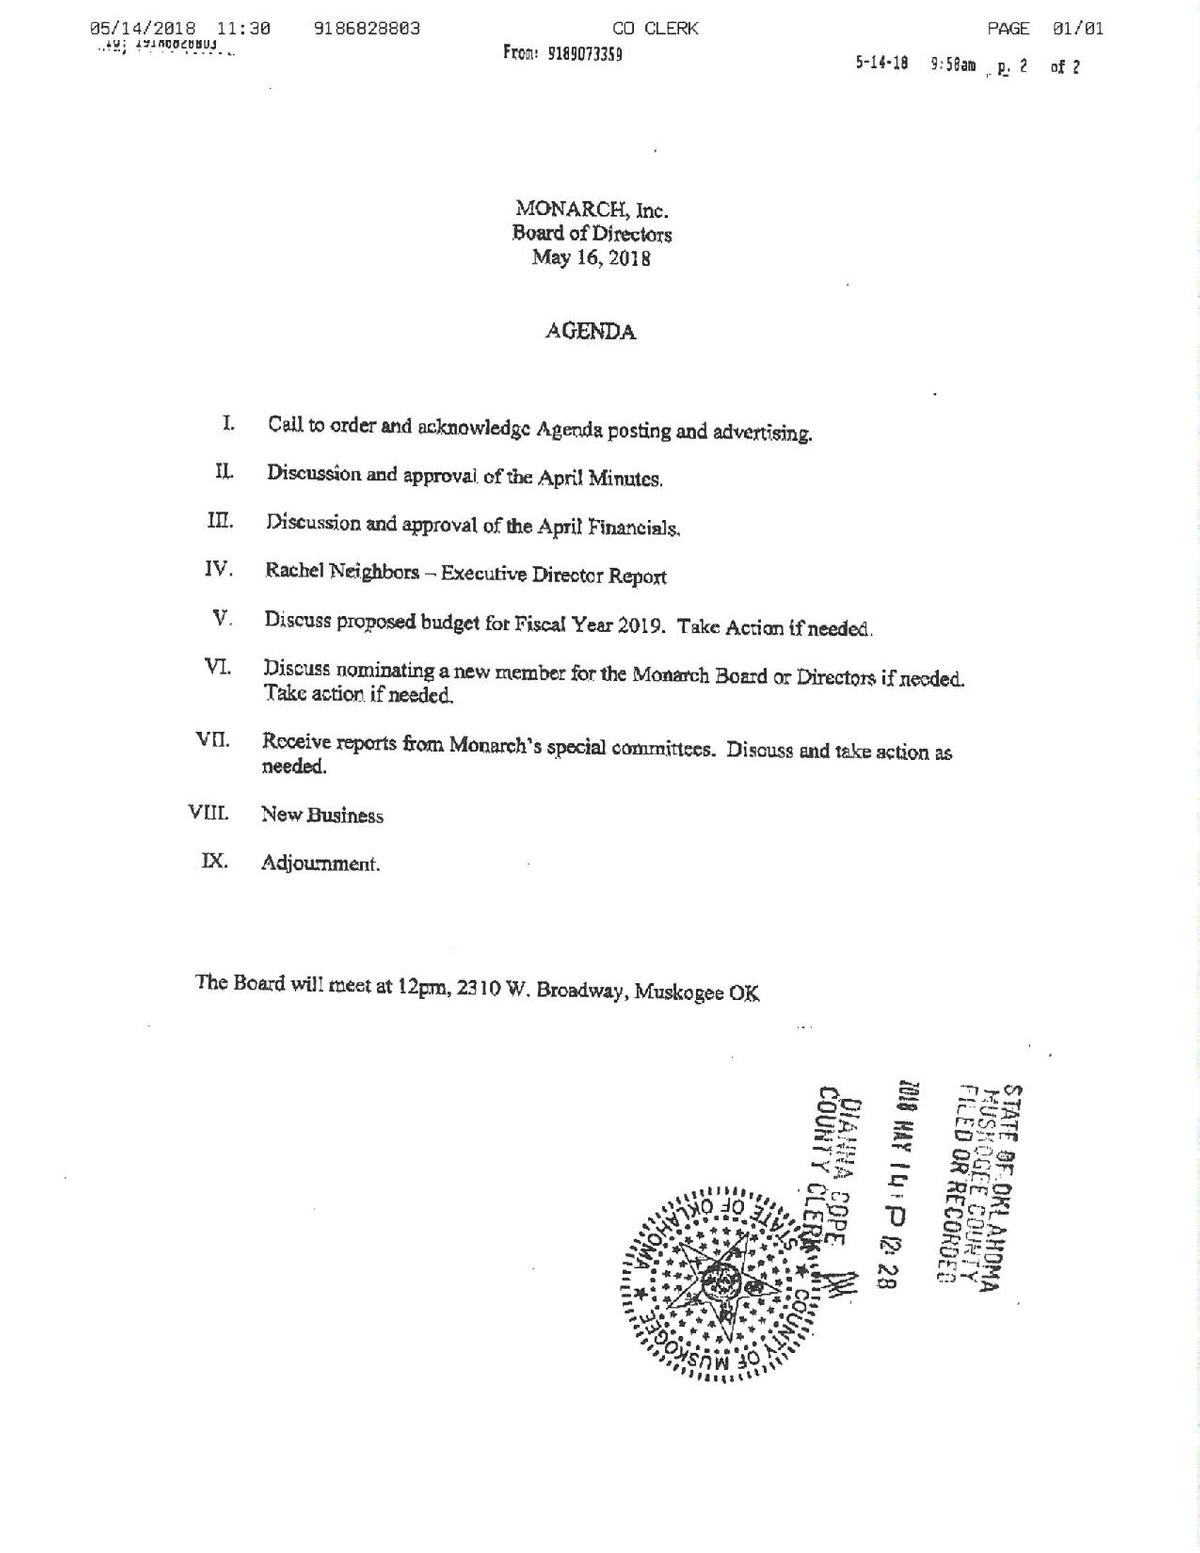 May board agenda.jpg